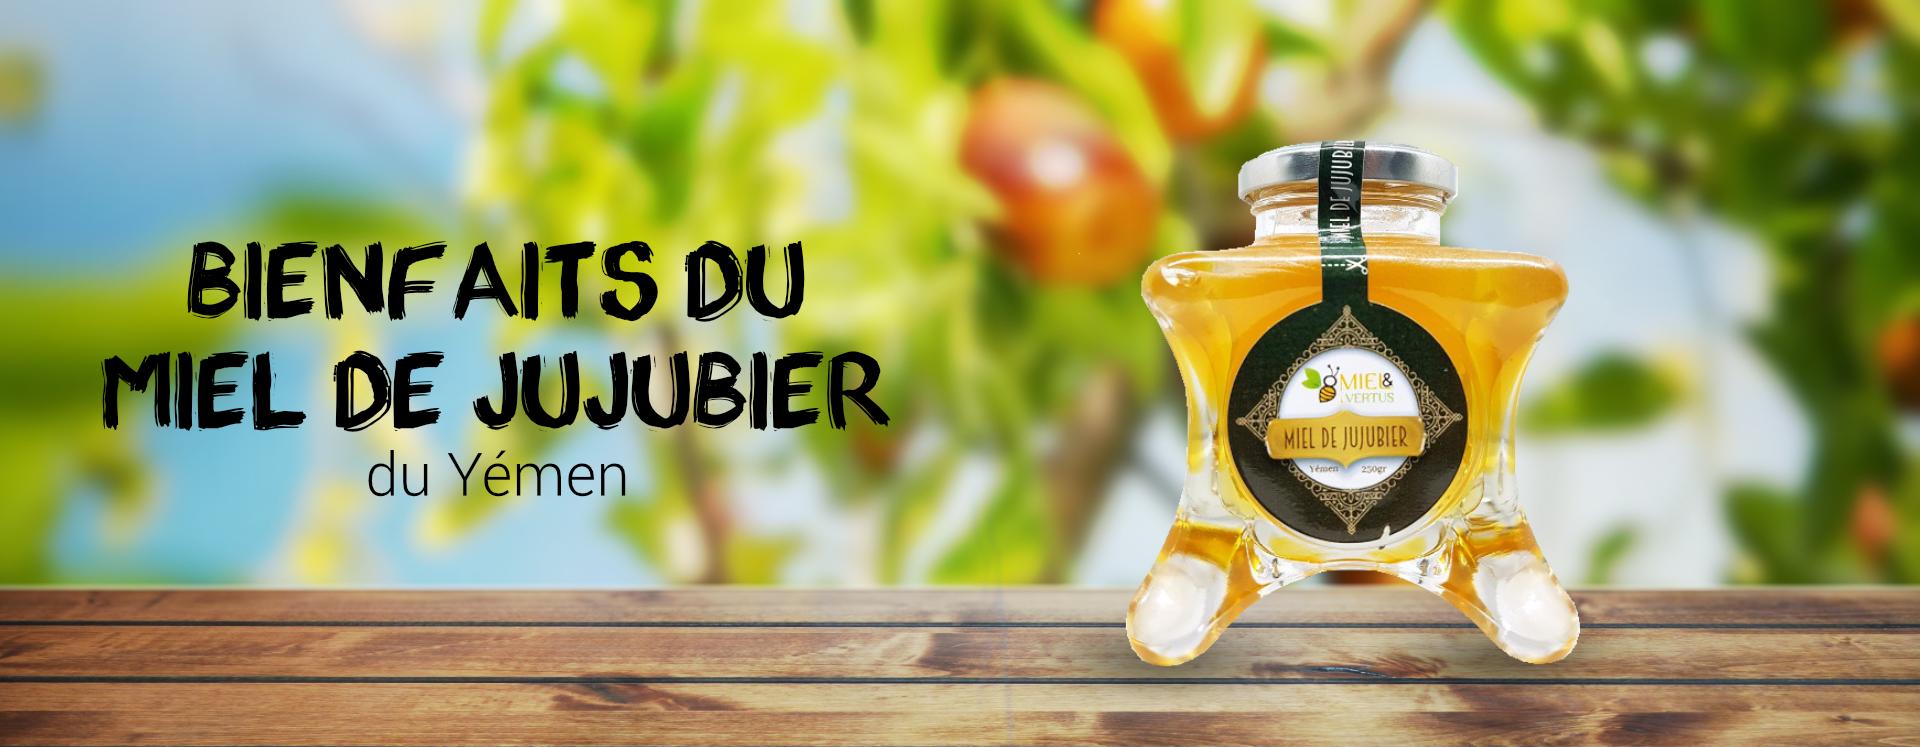 les-bienfaits-miel-jujubier-sidr-maliki-yemen